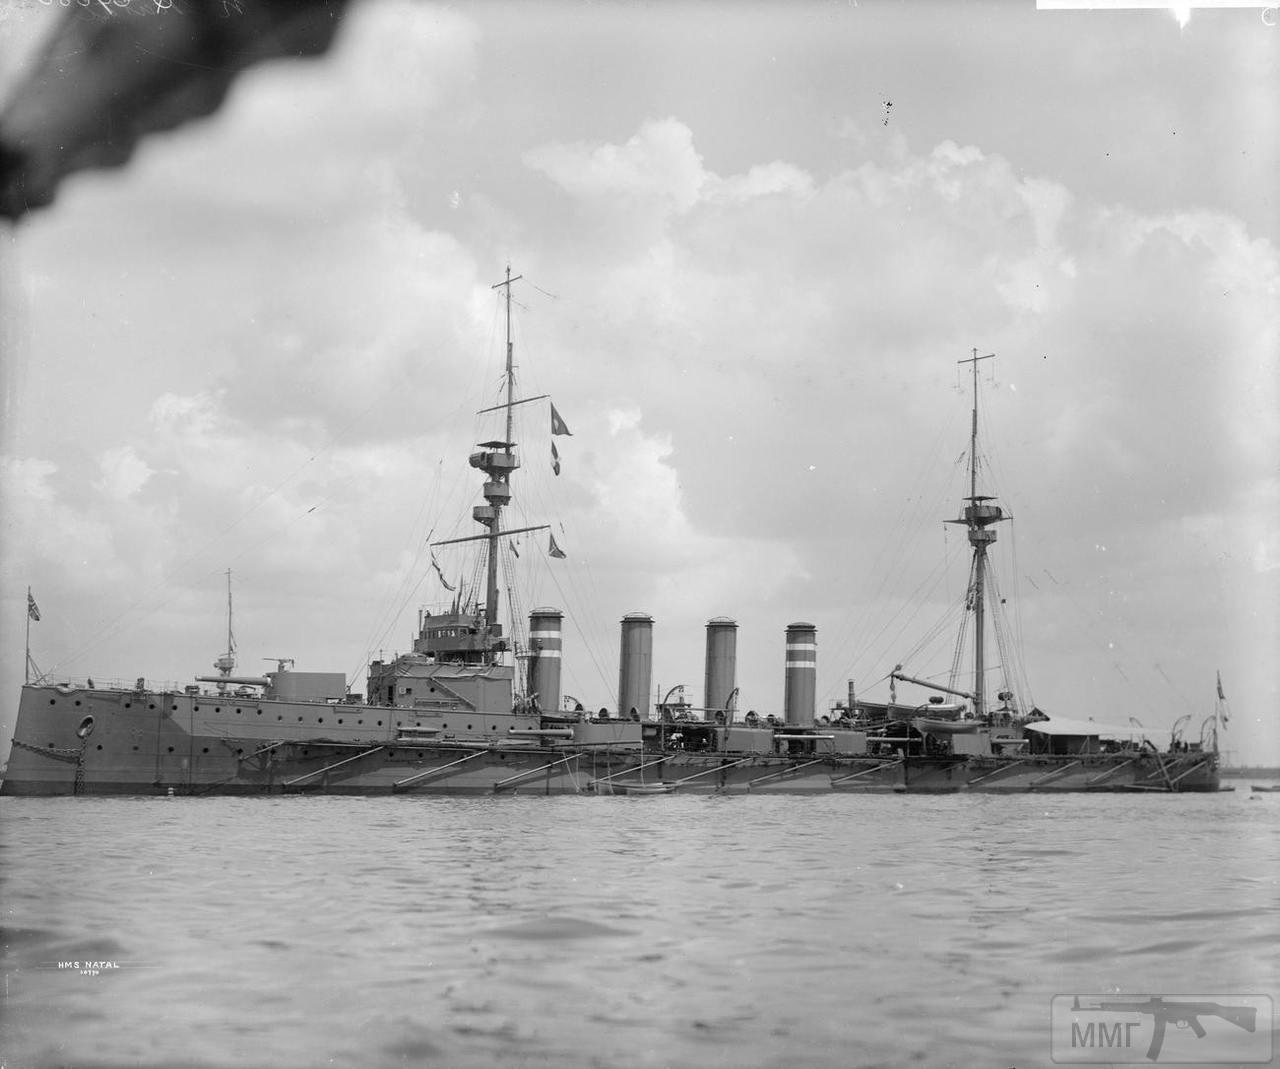 112929 - HMS Natal